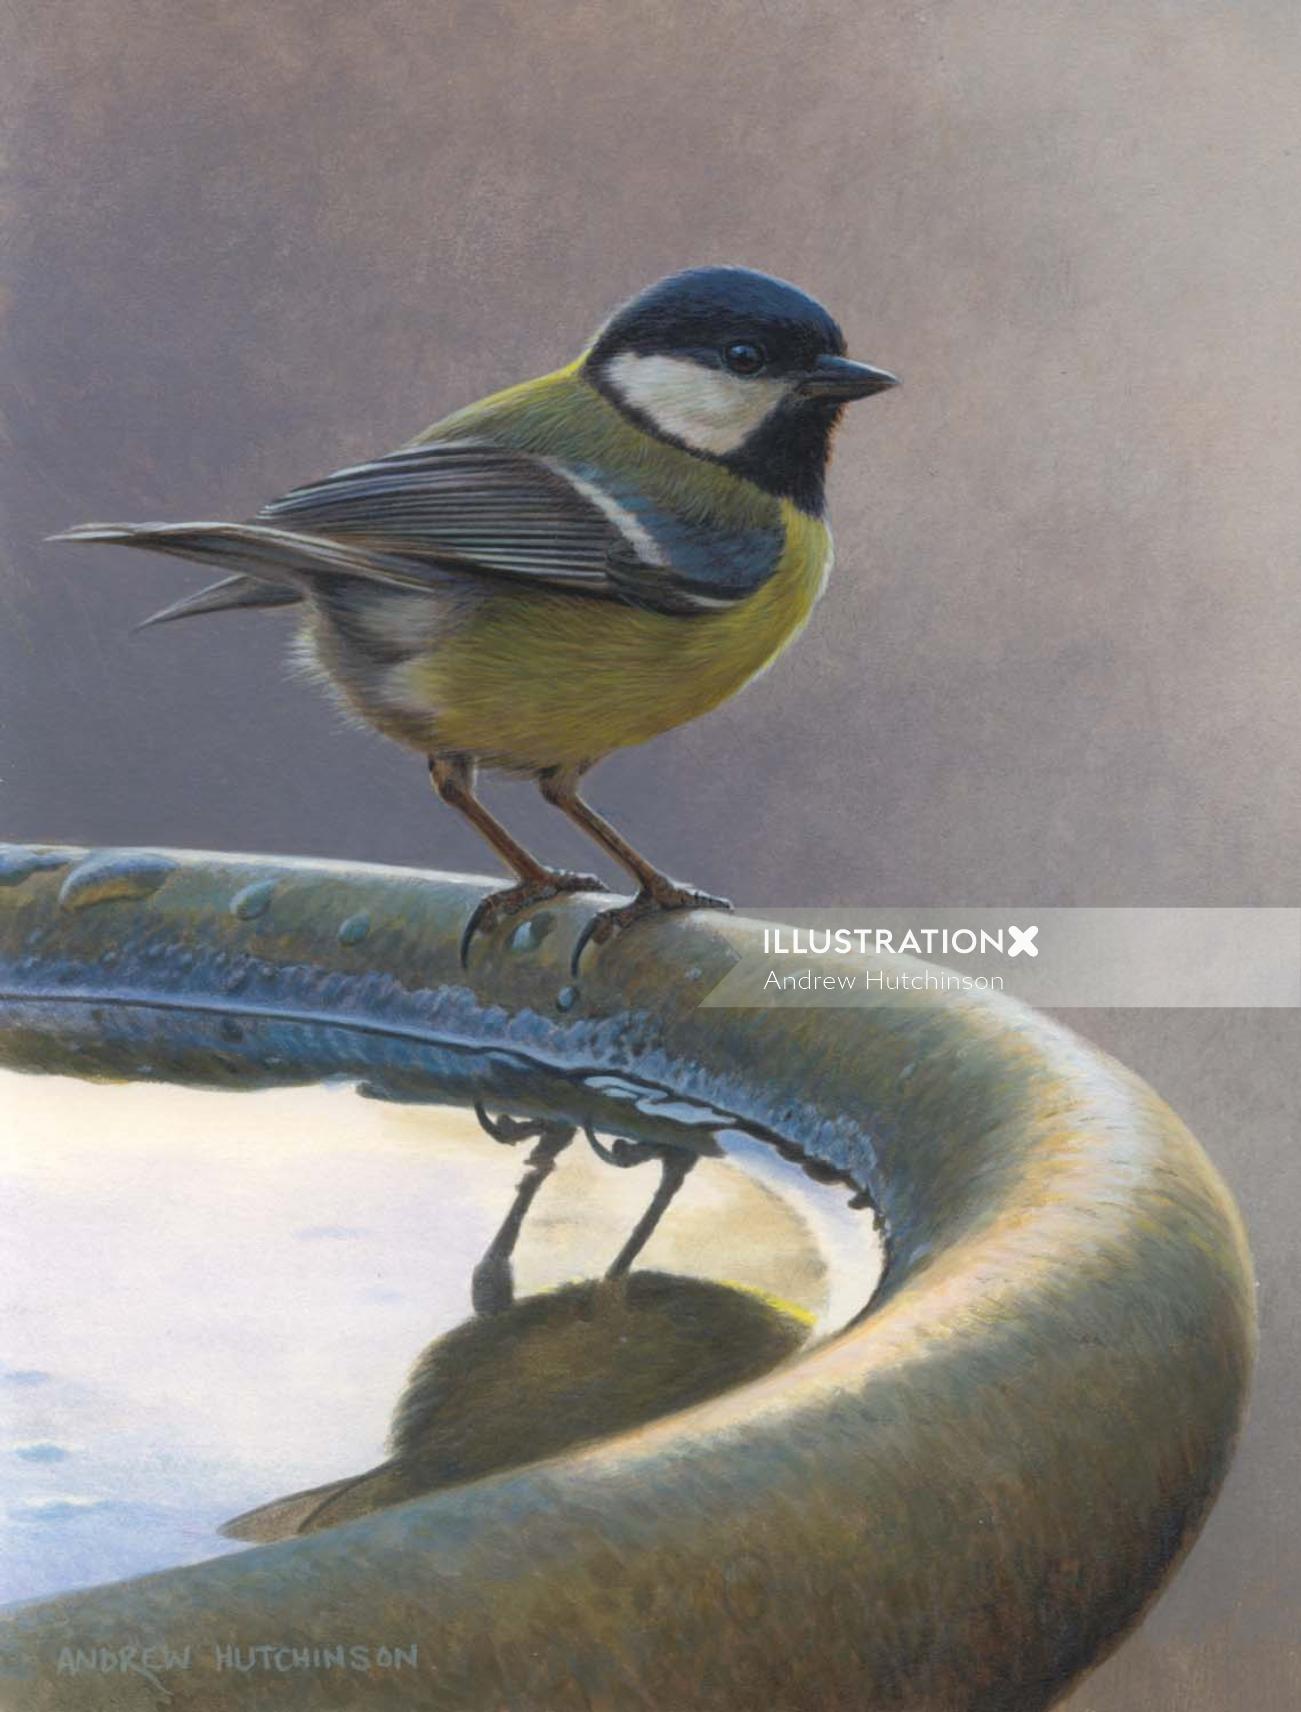 Bird illustration by Andrew Hutchinson